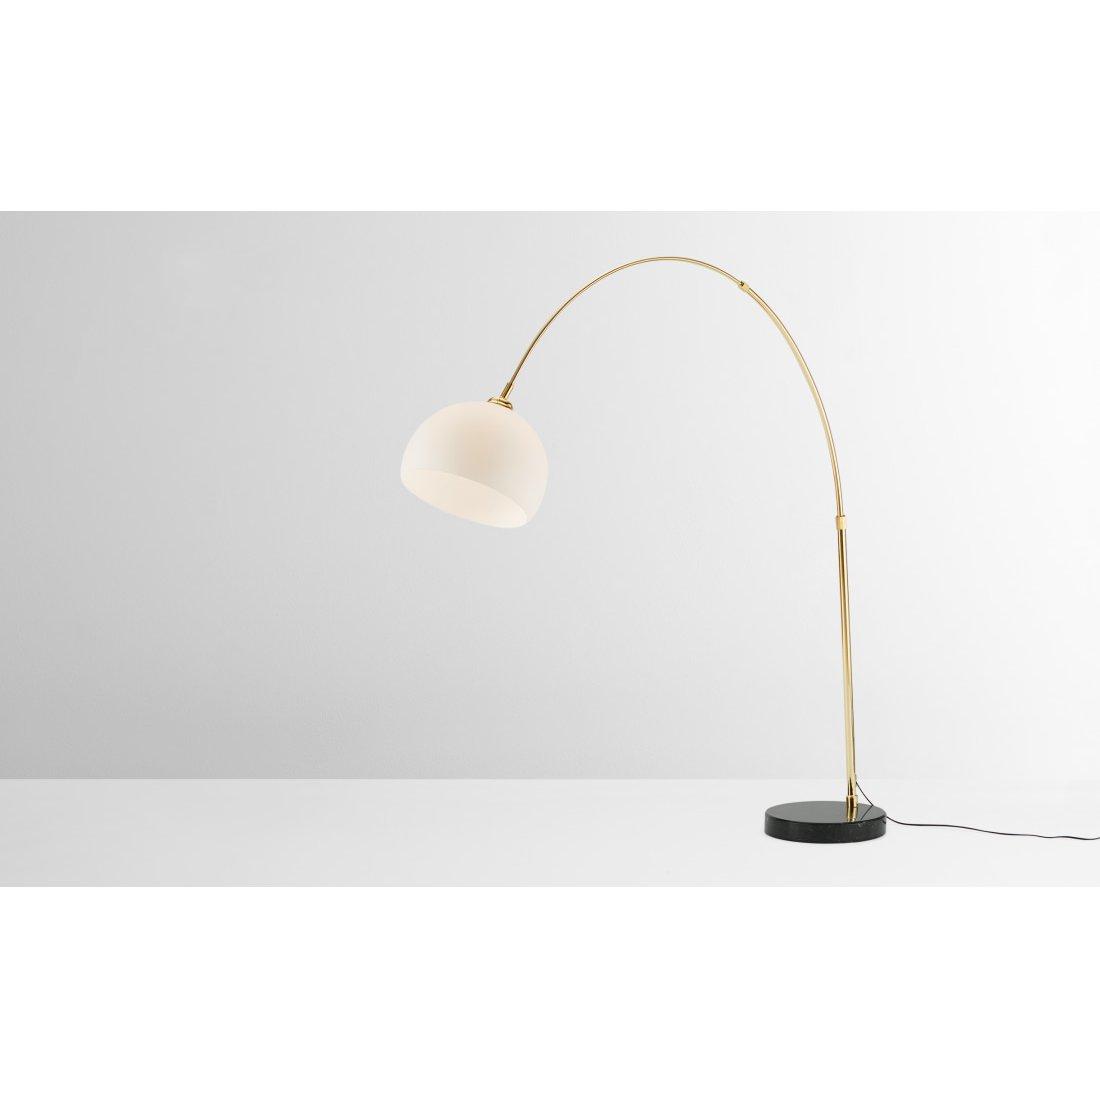 image-Bow Large Overeach Arc Floor Lamp, Brass, Black Marble & Opal Glass